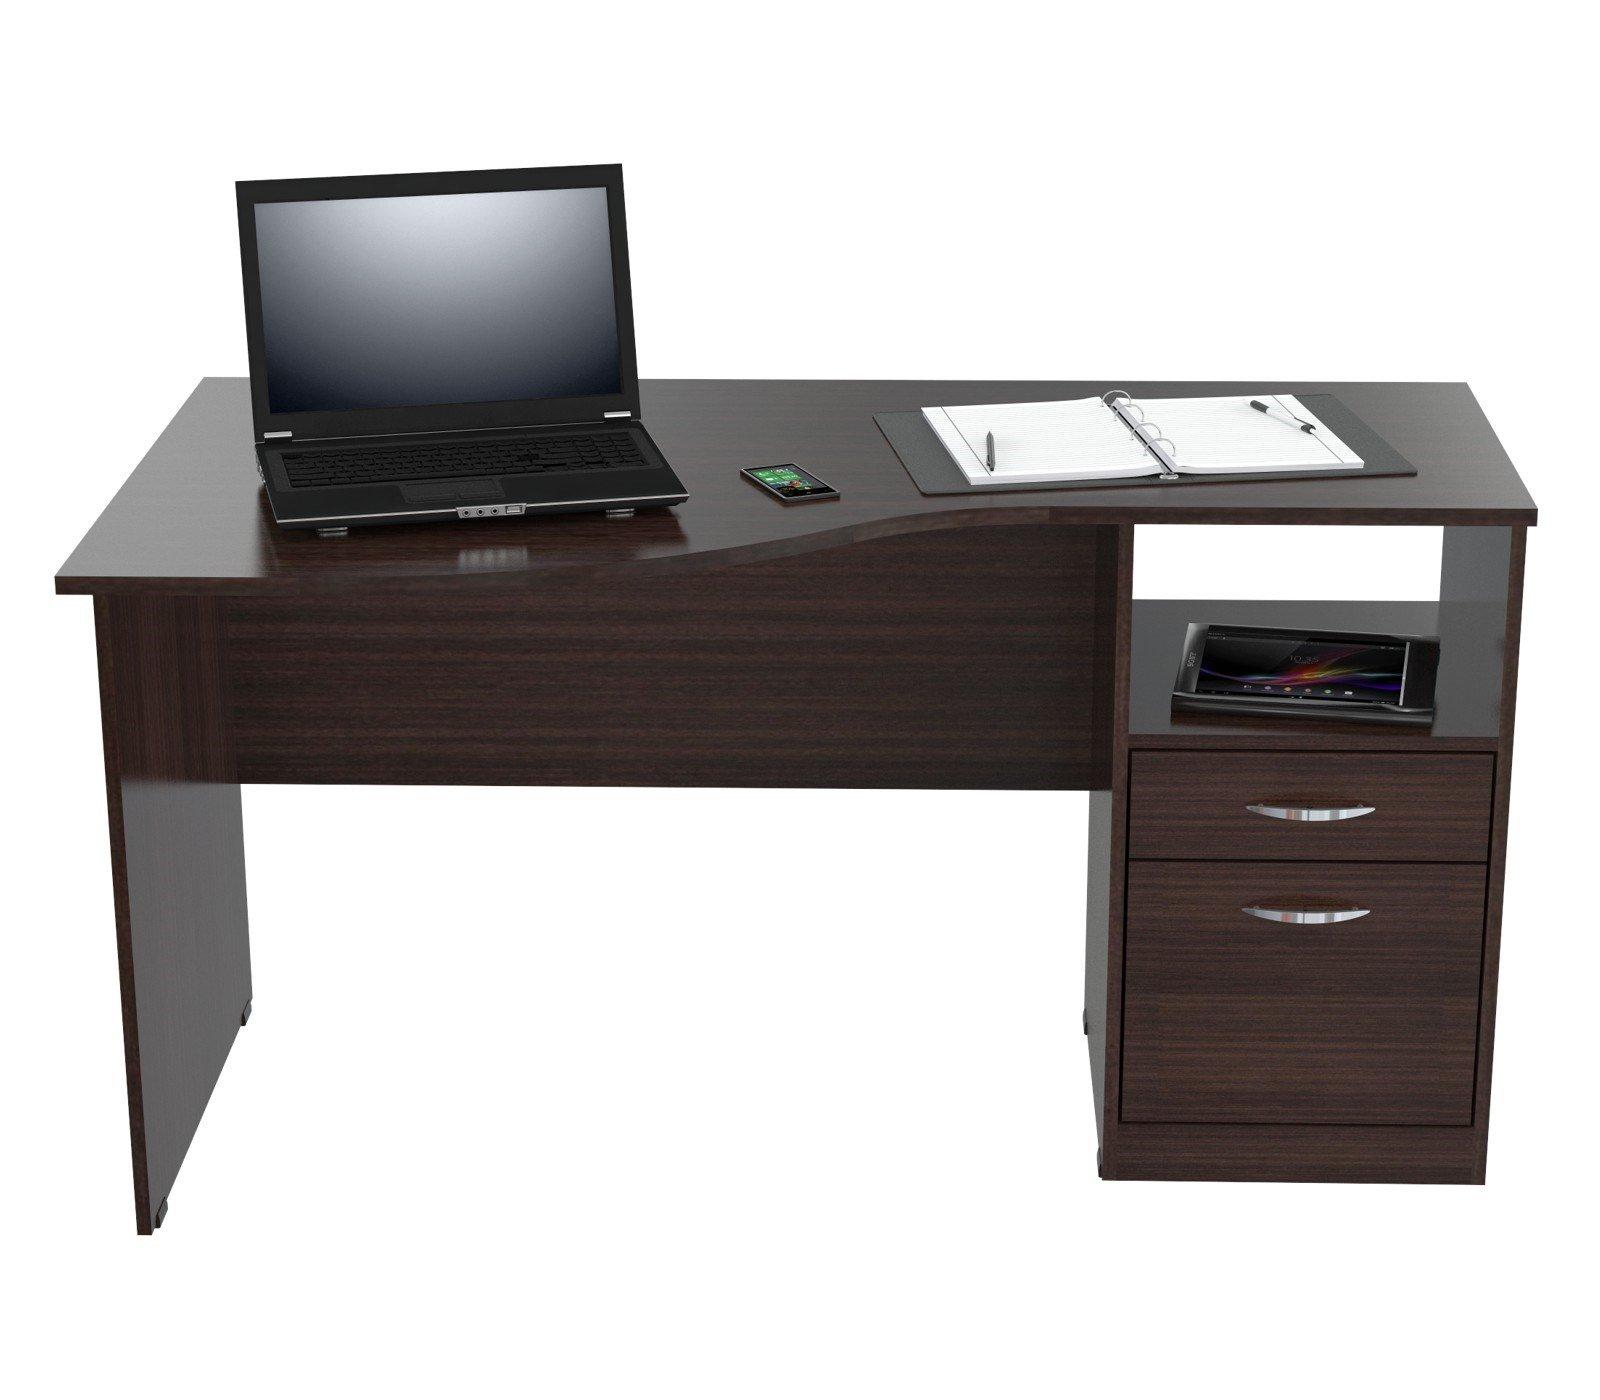 Inval America ES-2203 Curved Top Desk